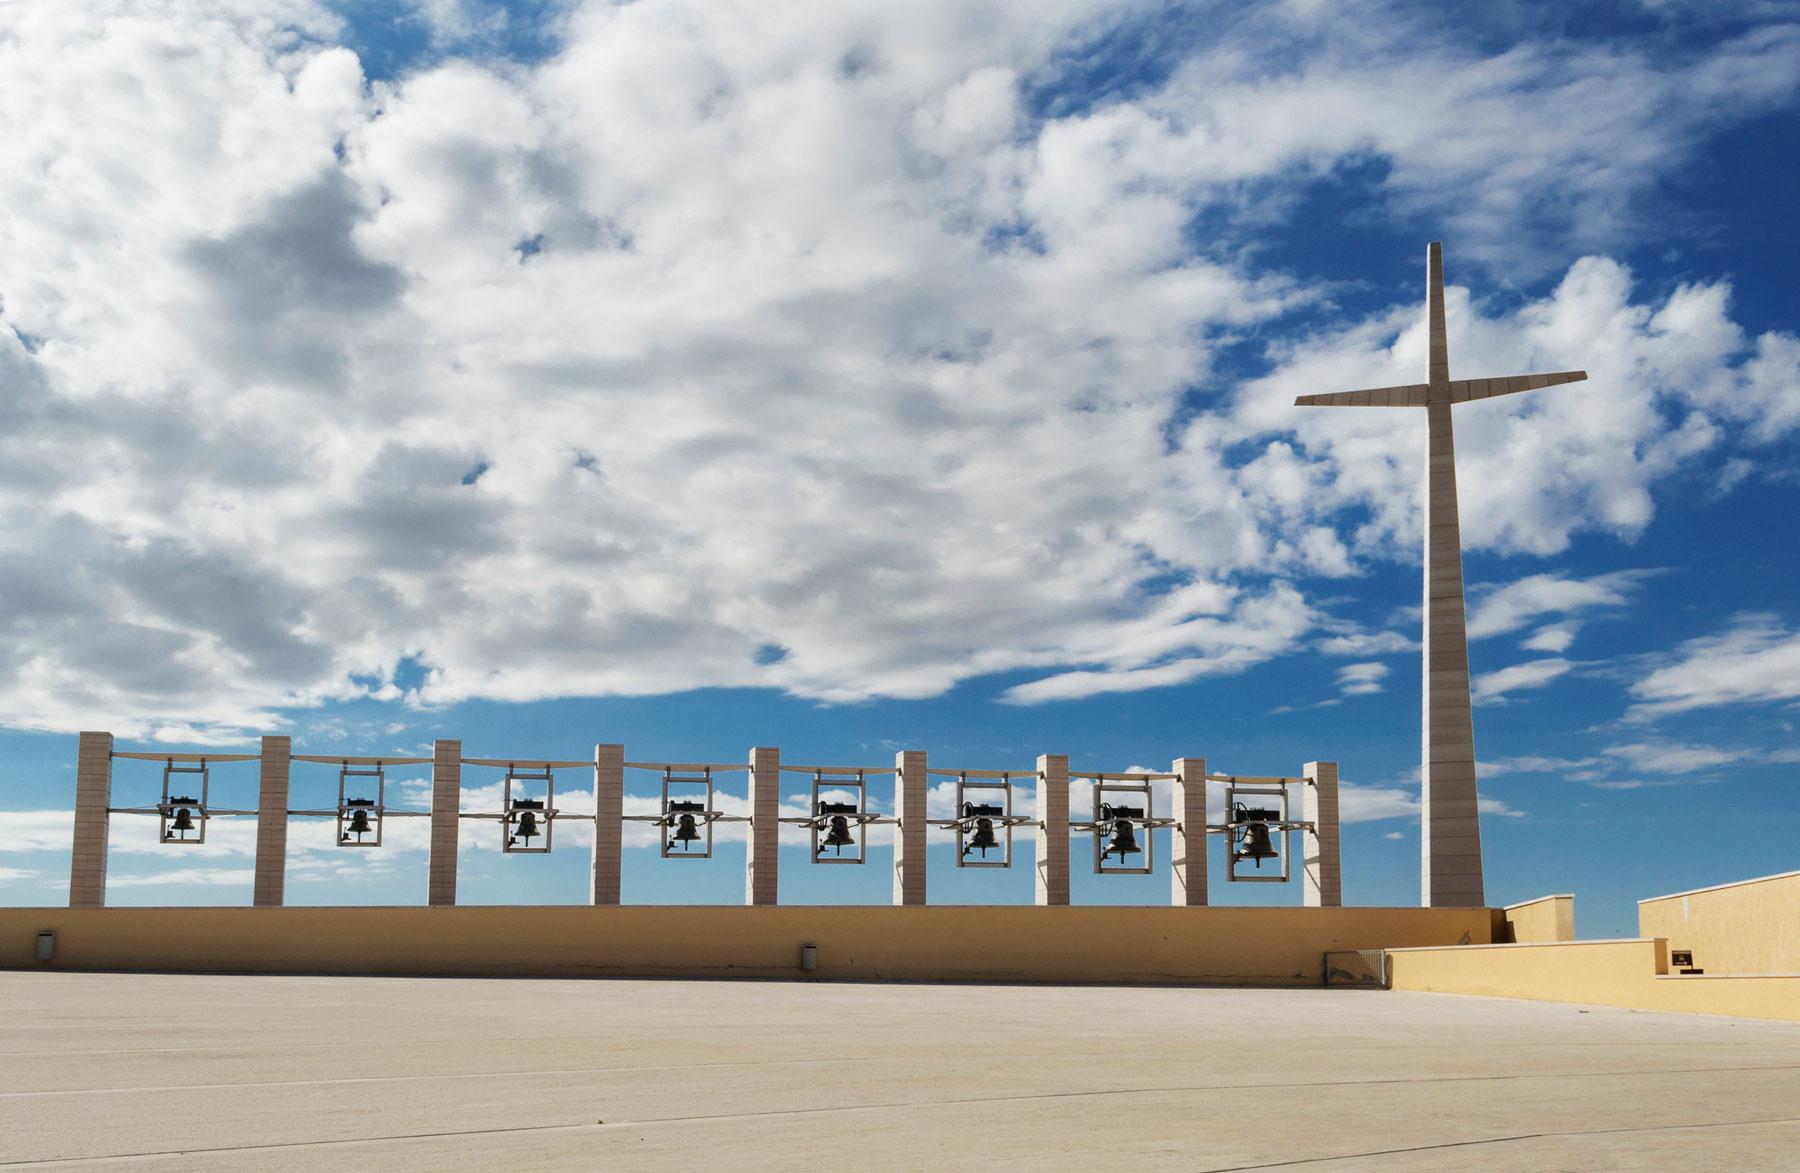 San Giovanni Rotondo Kirche Glocken iStock542082296 web